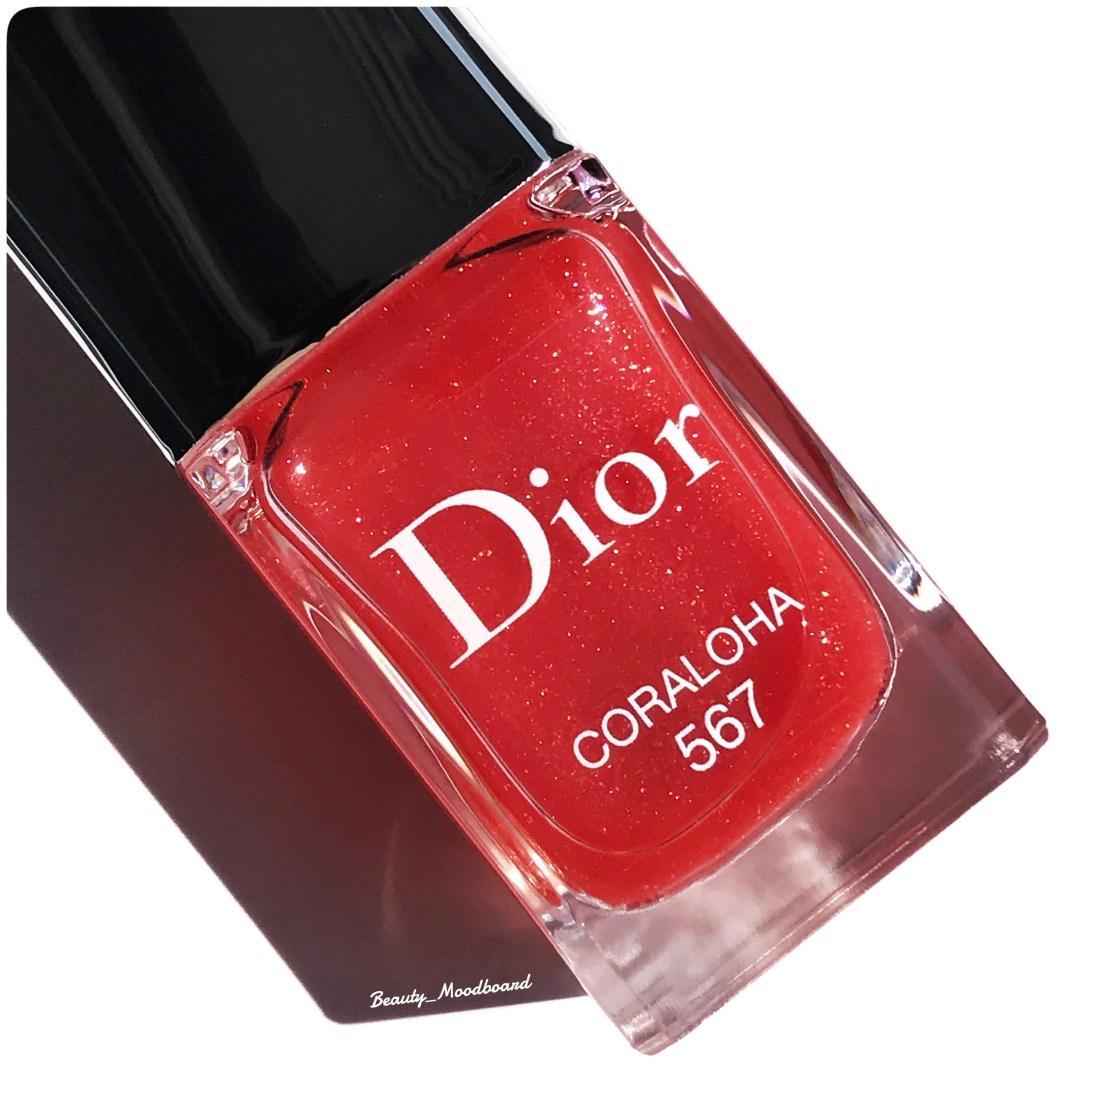 vernis 567 Dior couleur transparente corail